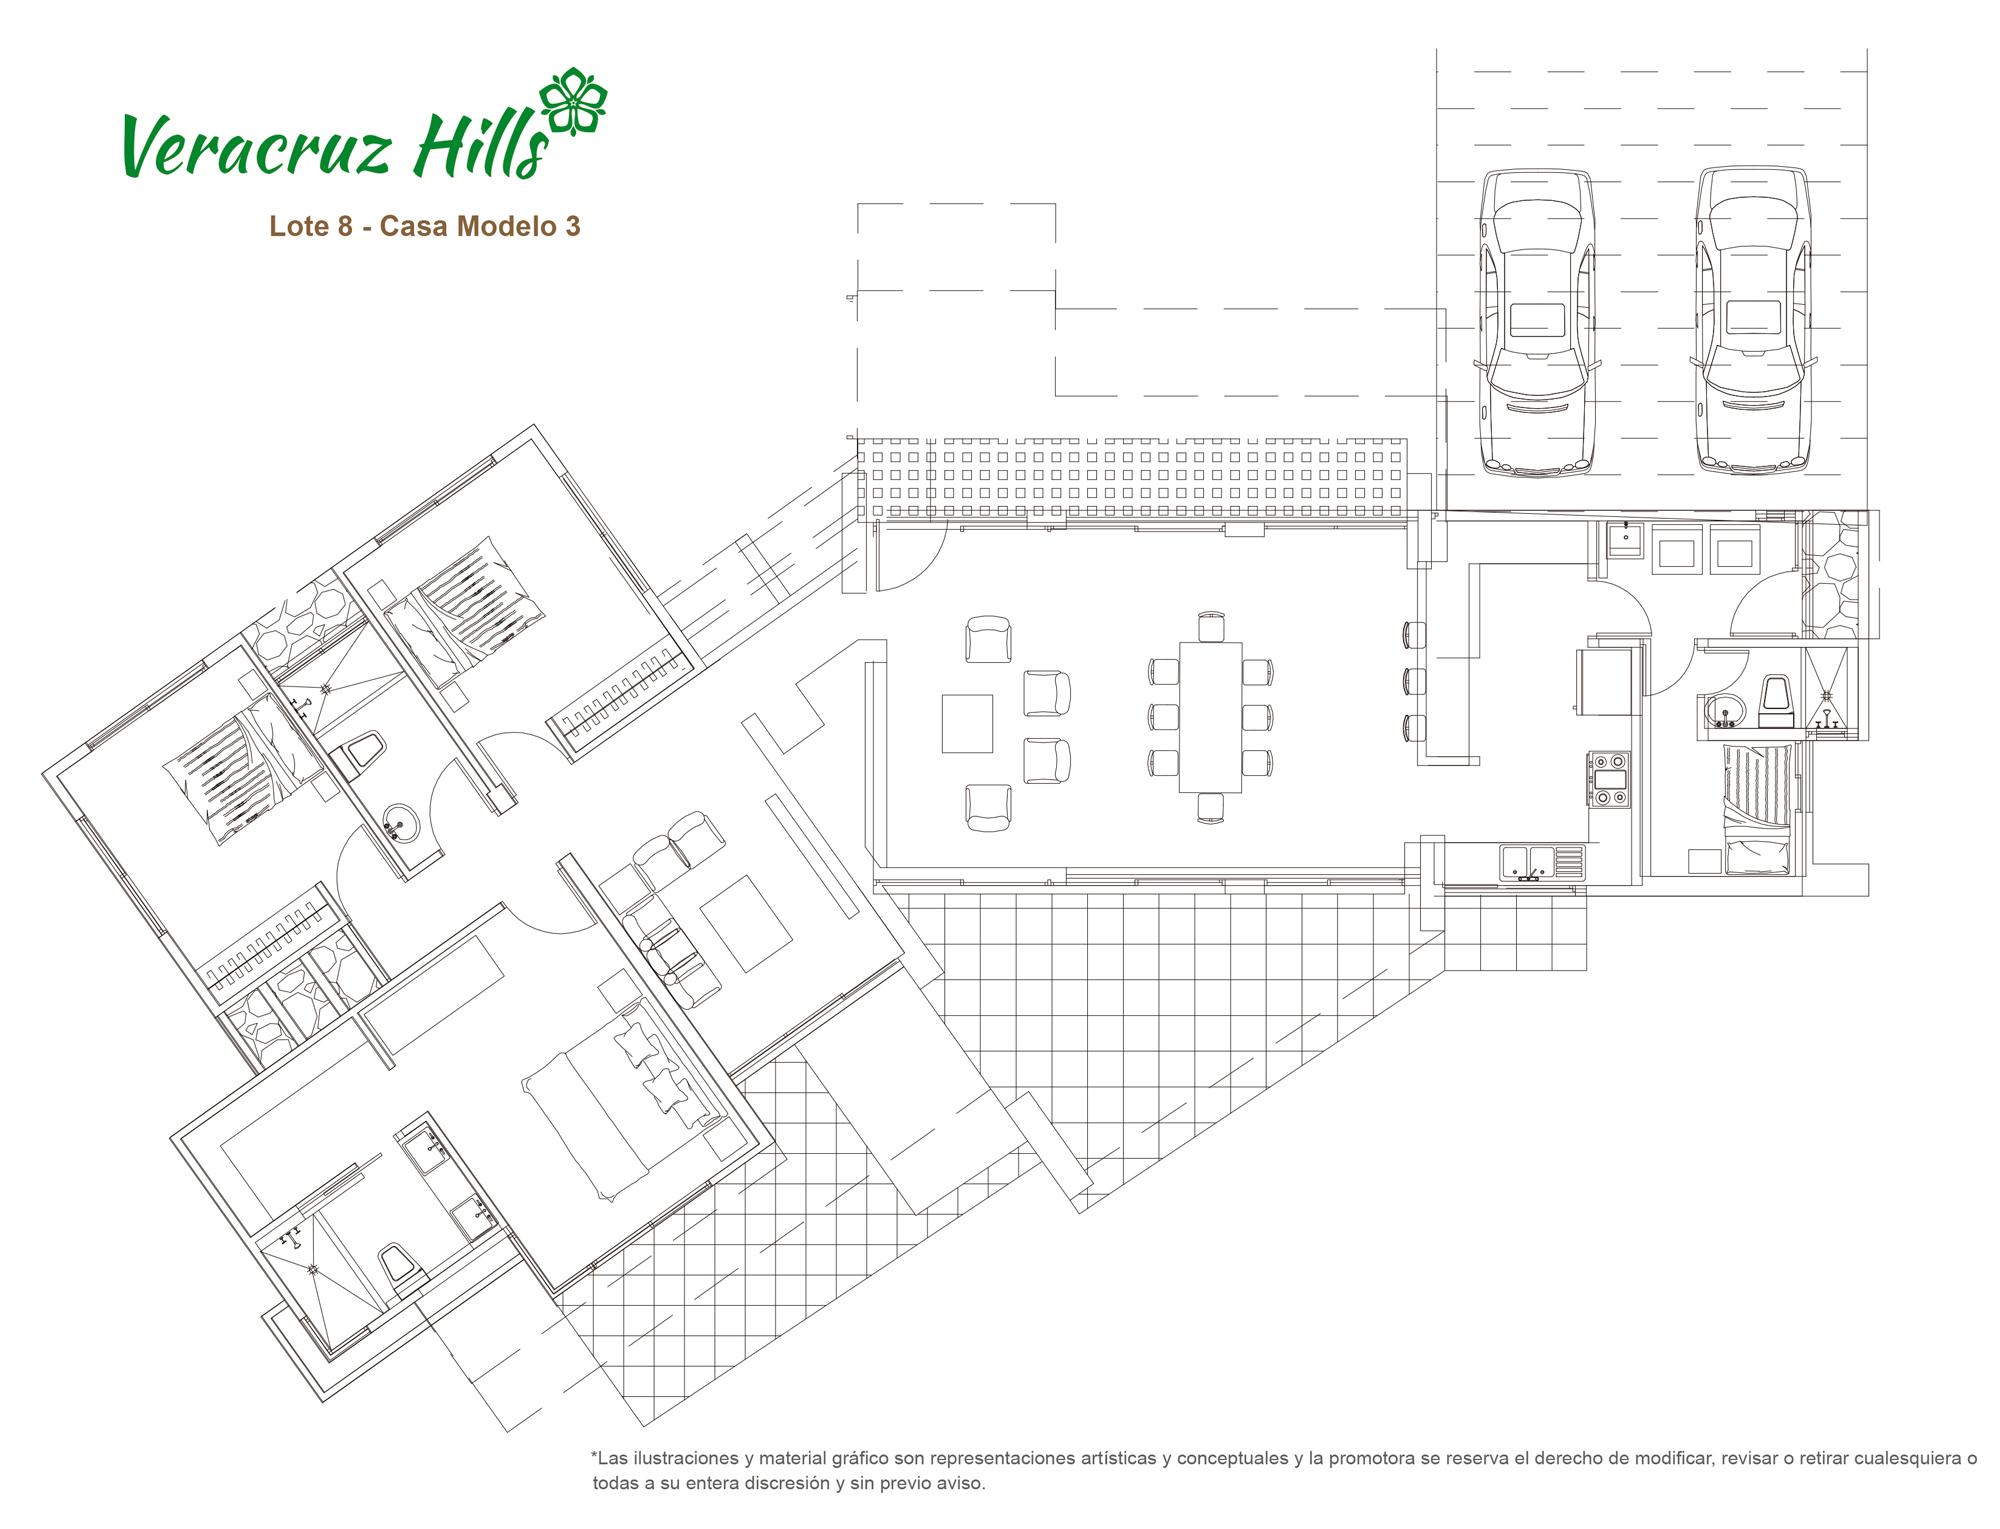 Veracruz Hills - Modelo 3